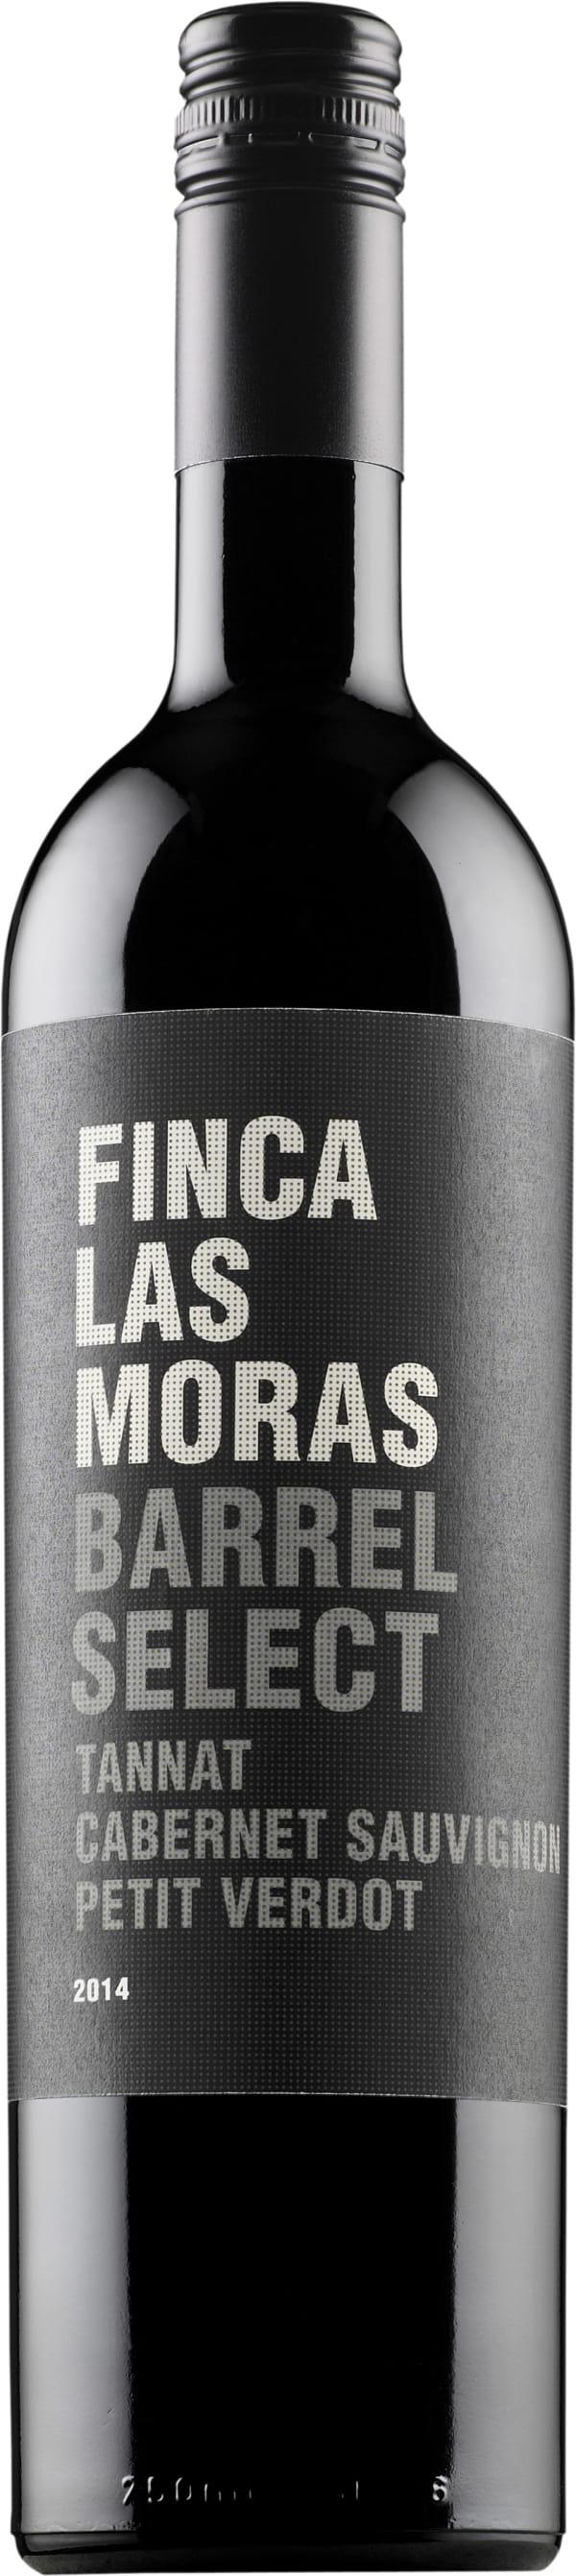 Finca Las Moras Barrel Select Tannat Cabernet Sauvignon Petit Verdot 2016